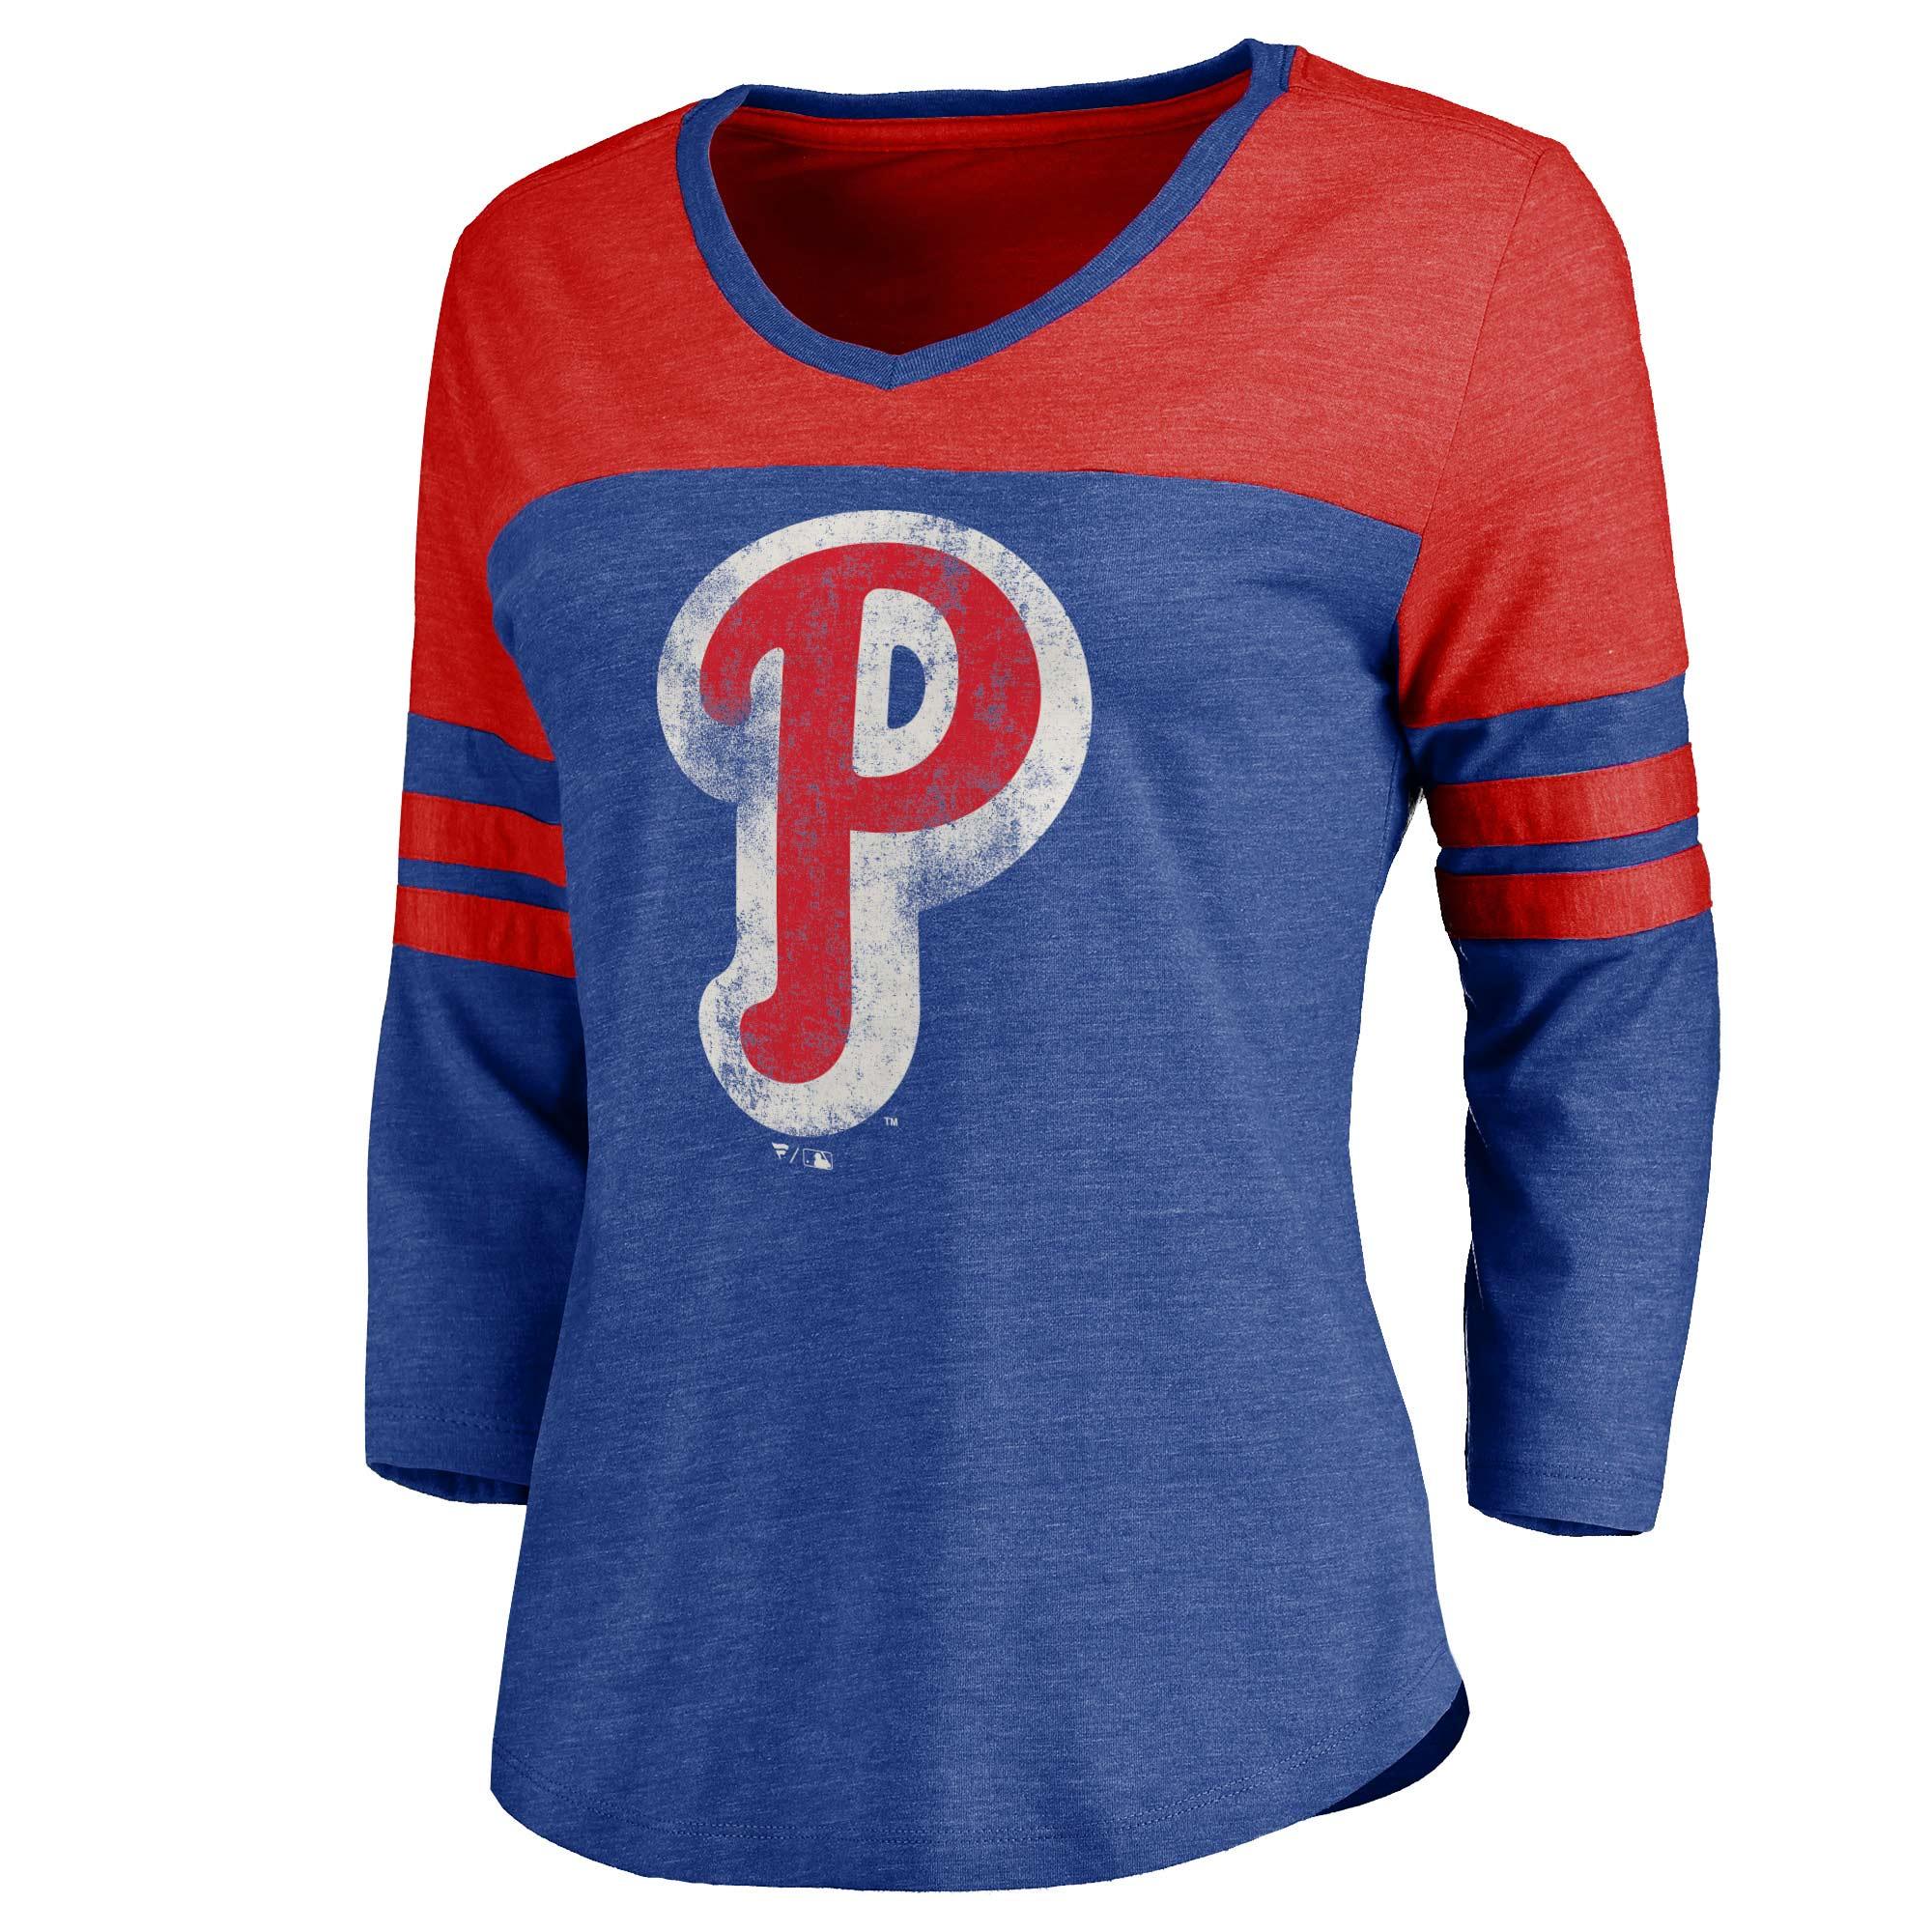 Philadelphia Phillies Women's Cooperstown Two Tone Three-Quarter Sleeve Tri-Blend T-Shirt - Royal/Red